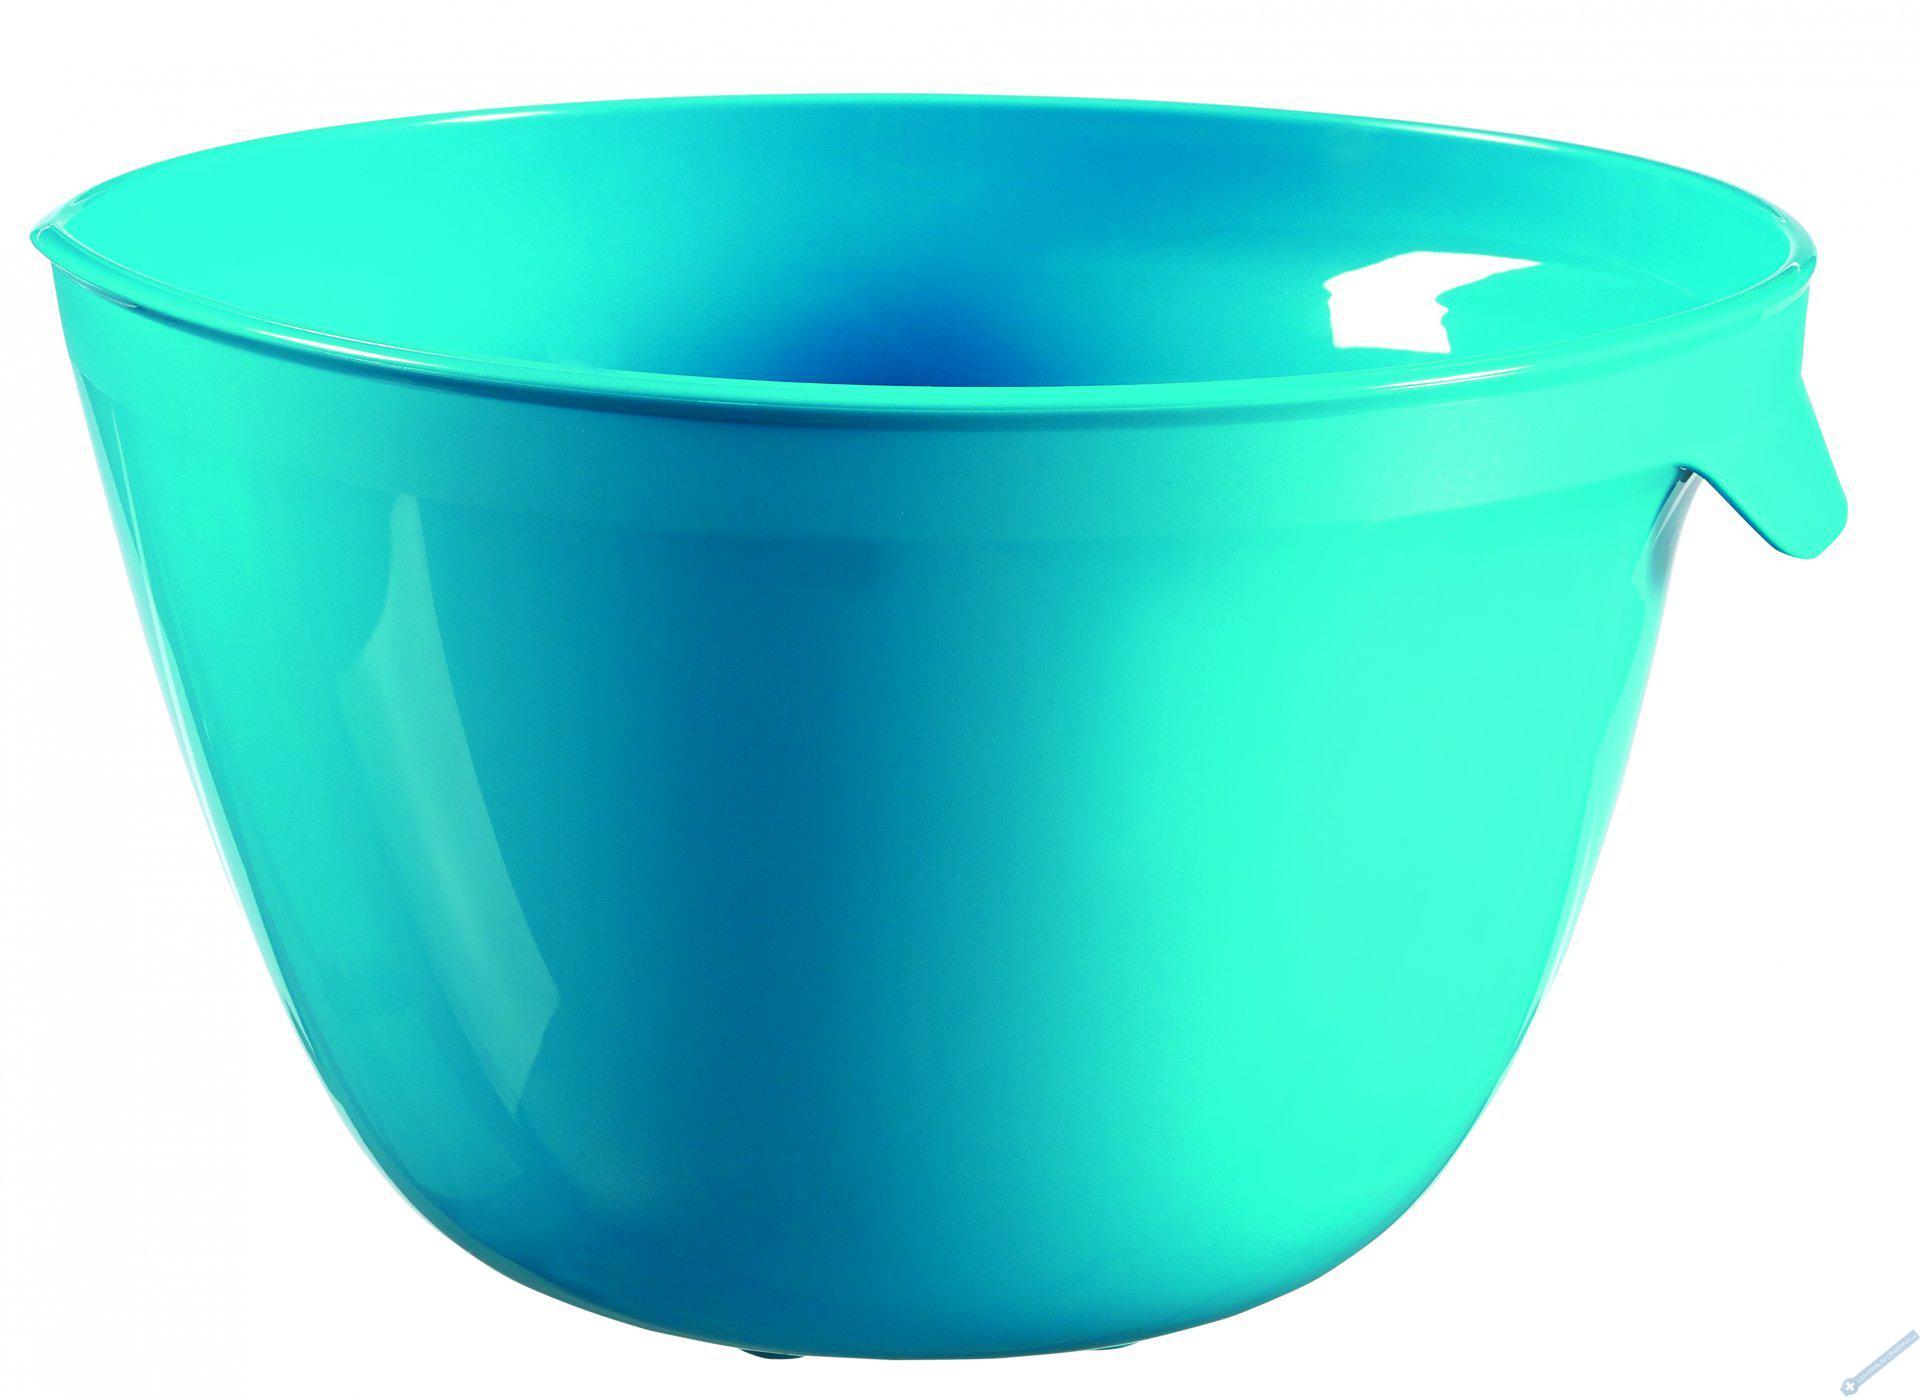 Šlehací mísa 3,5l modrá